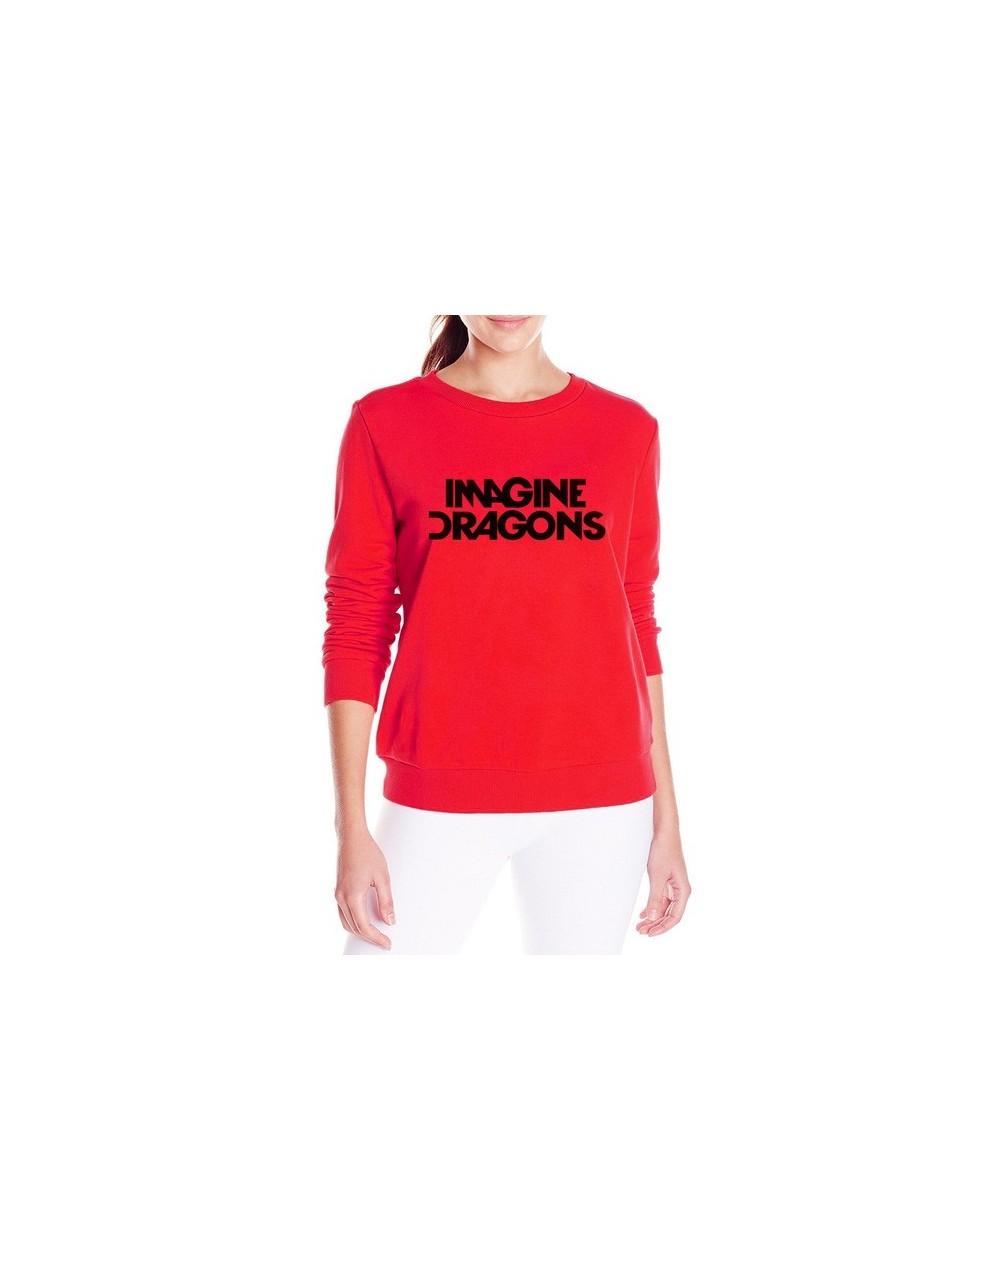 2019 autumn New sweatshirt Women woman's quality Printed Funny brand tracksuit moleton feminino hoody harajuku hoodies femme...